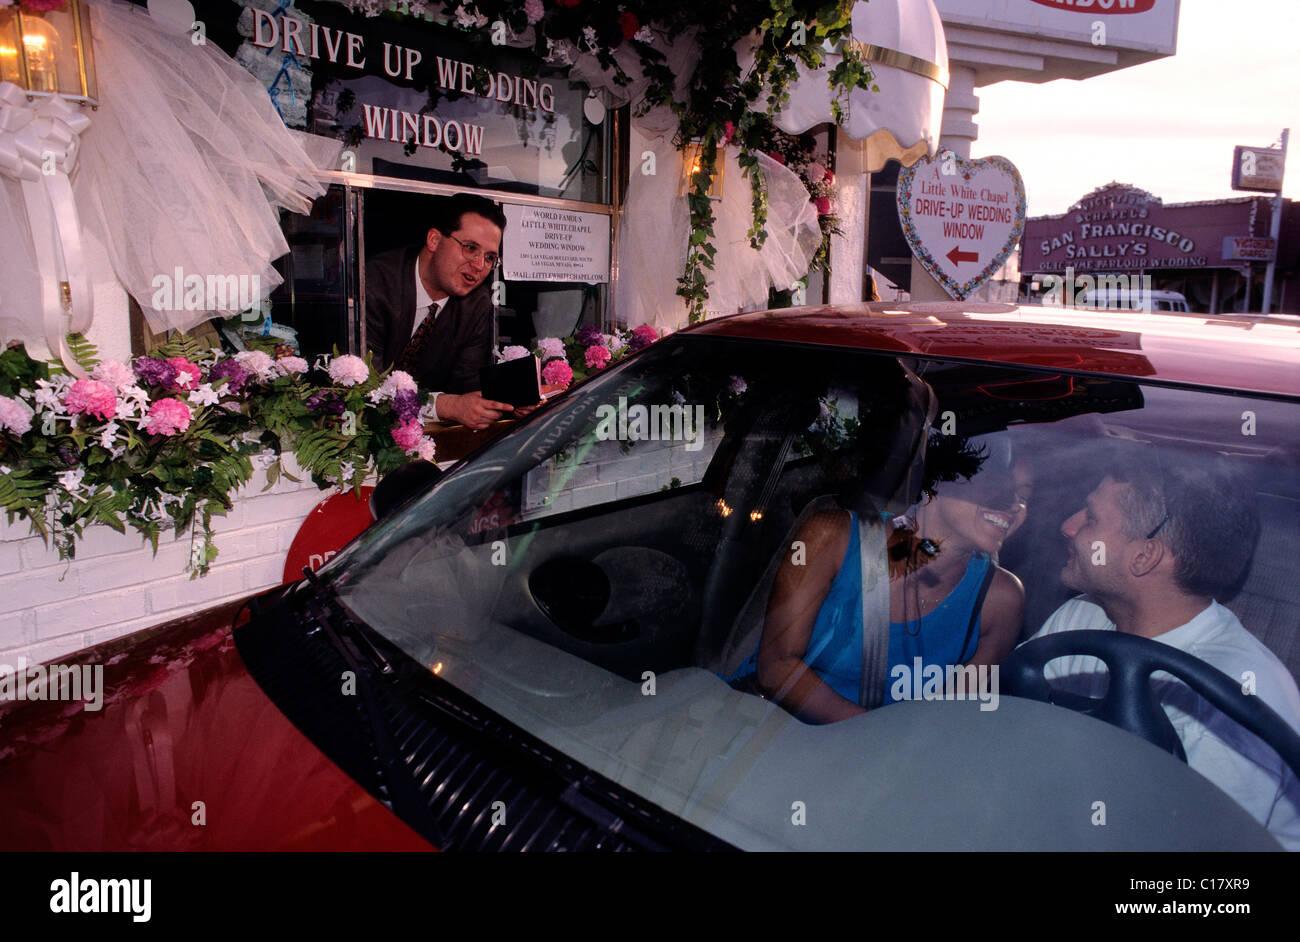 United States Nevada Las Vegas Drive Thru Wedding At Little White